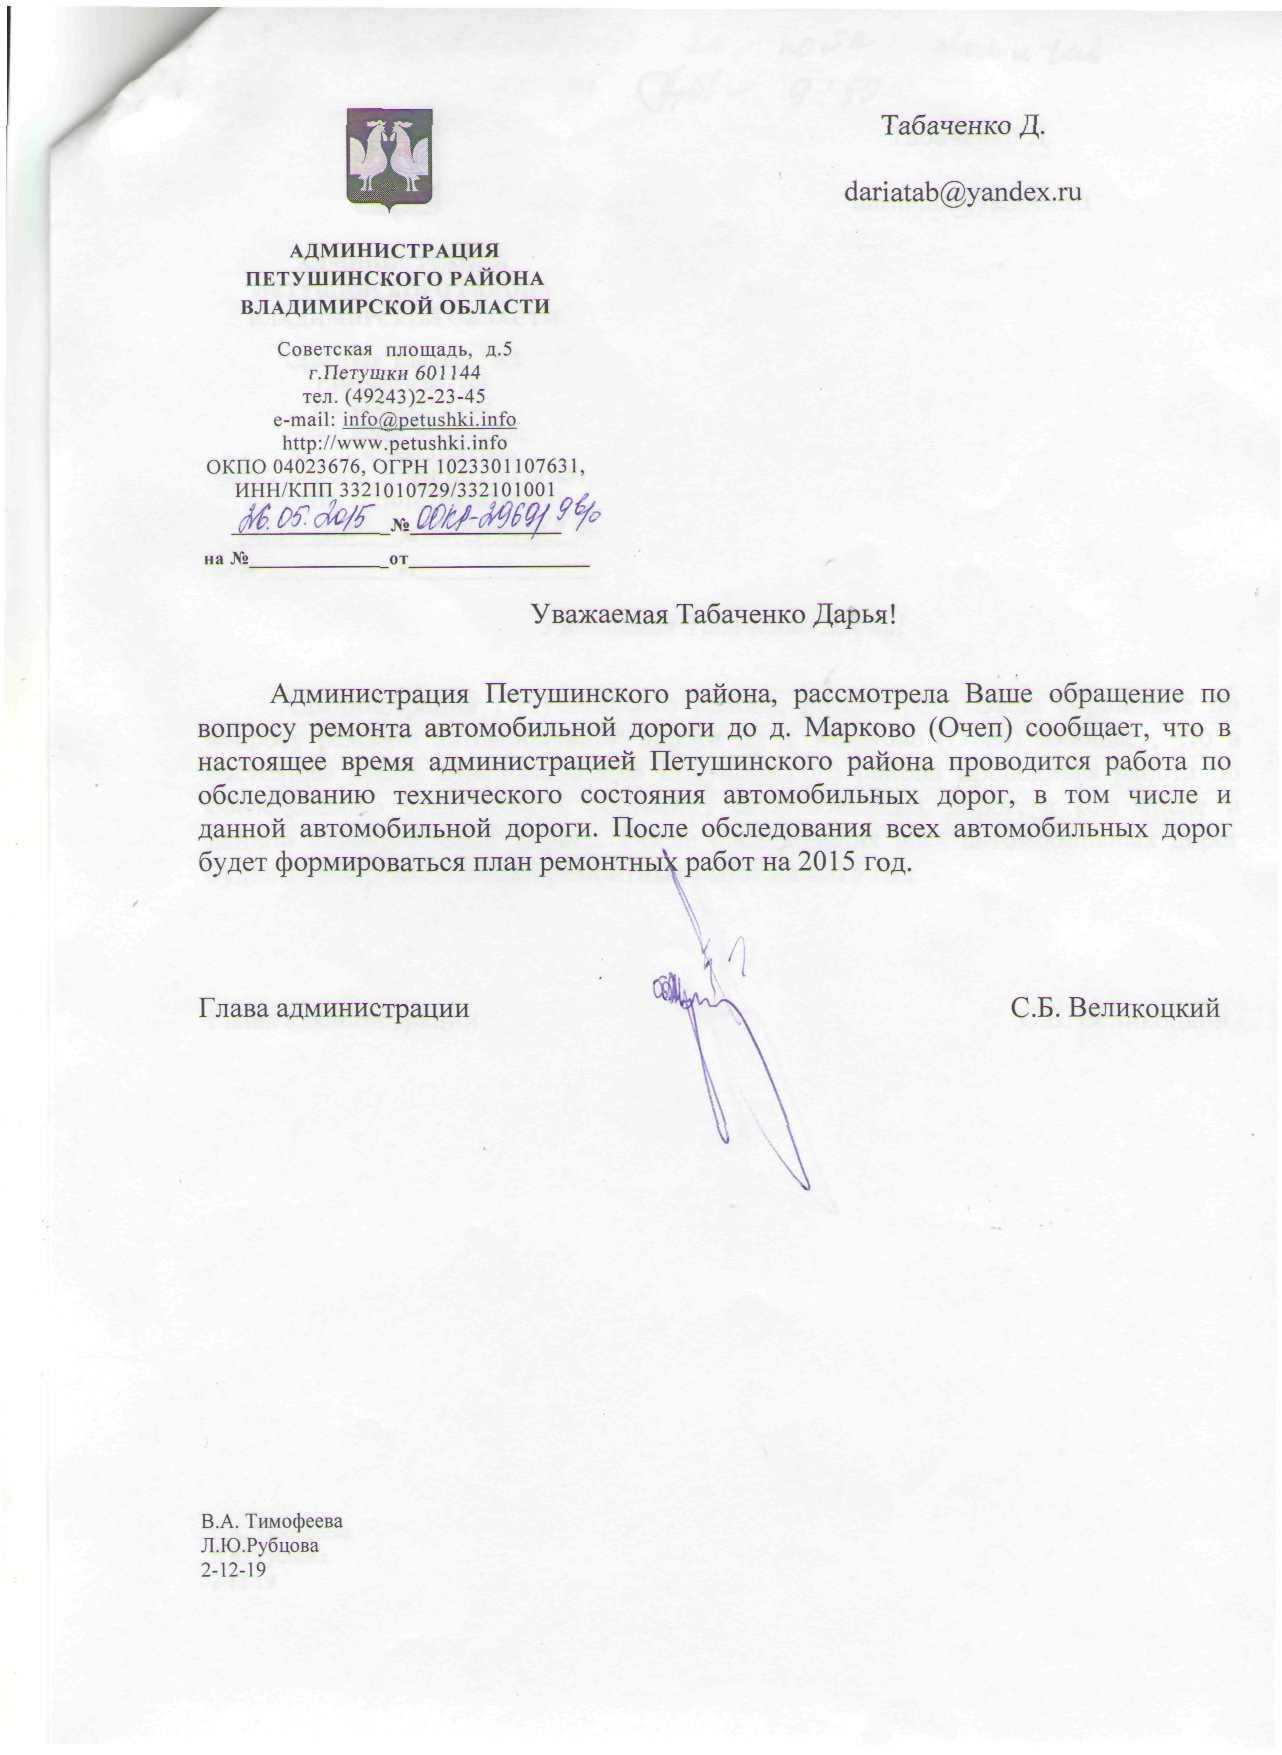 Ответ на обращение Табаченко Д.